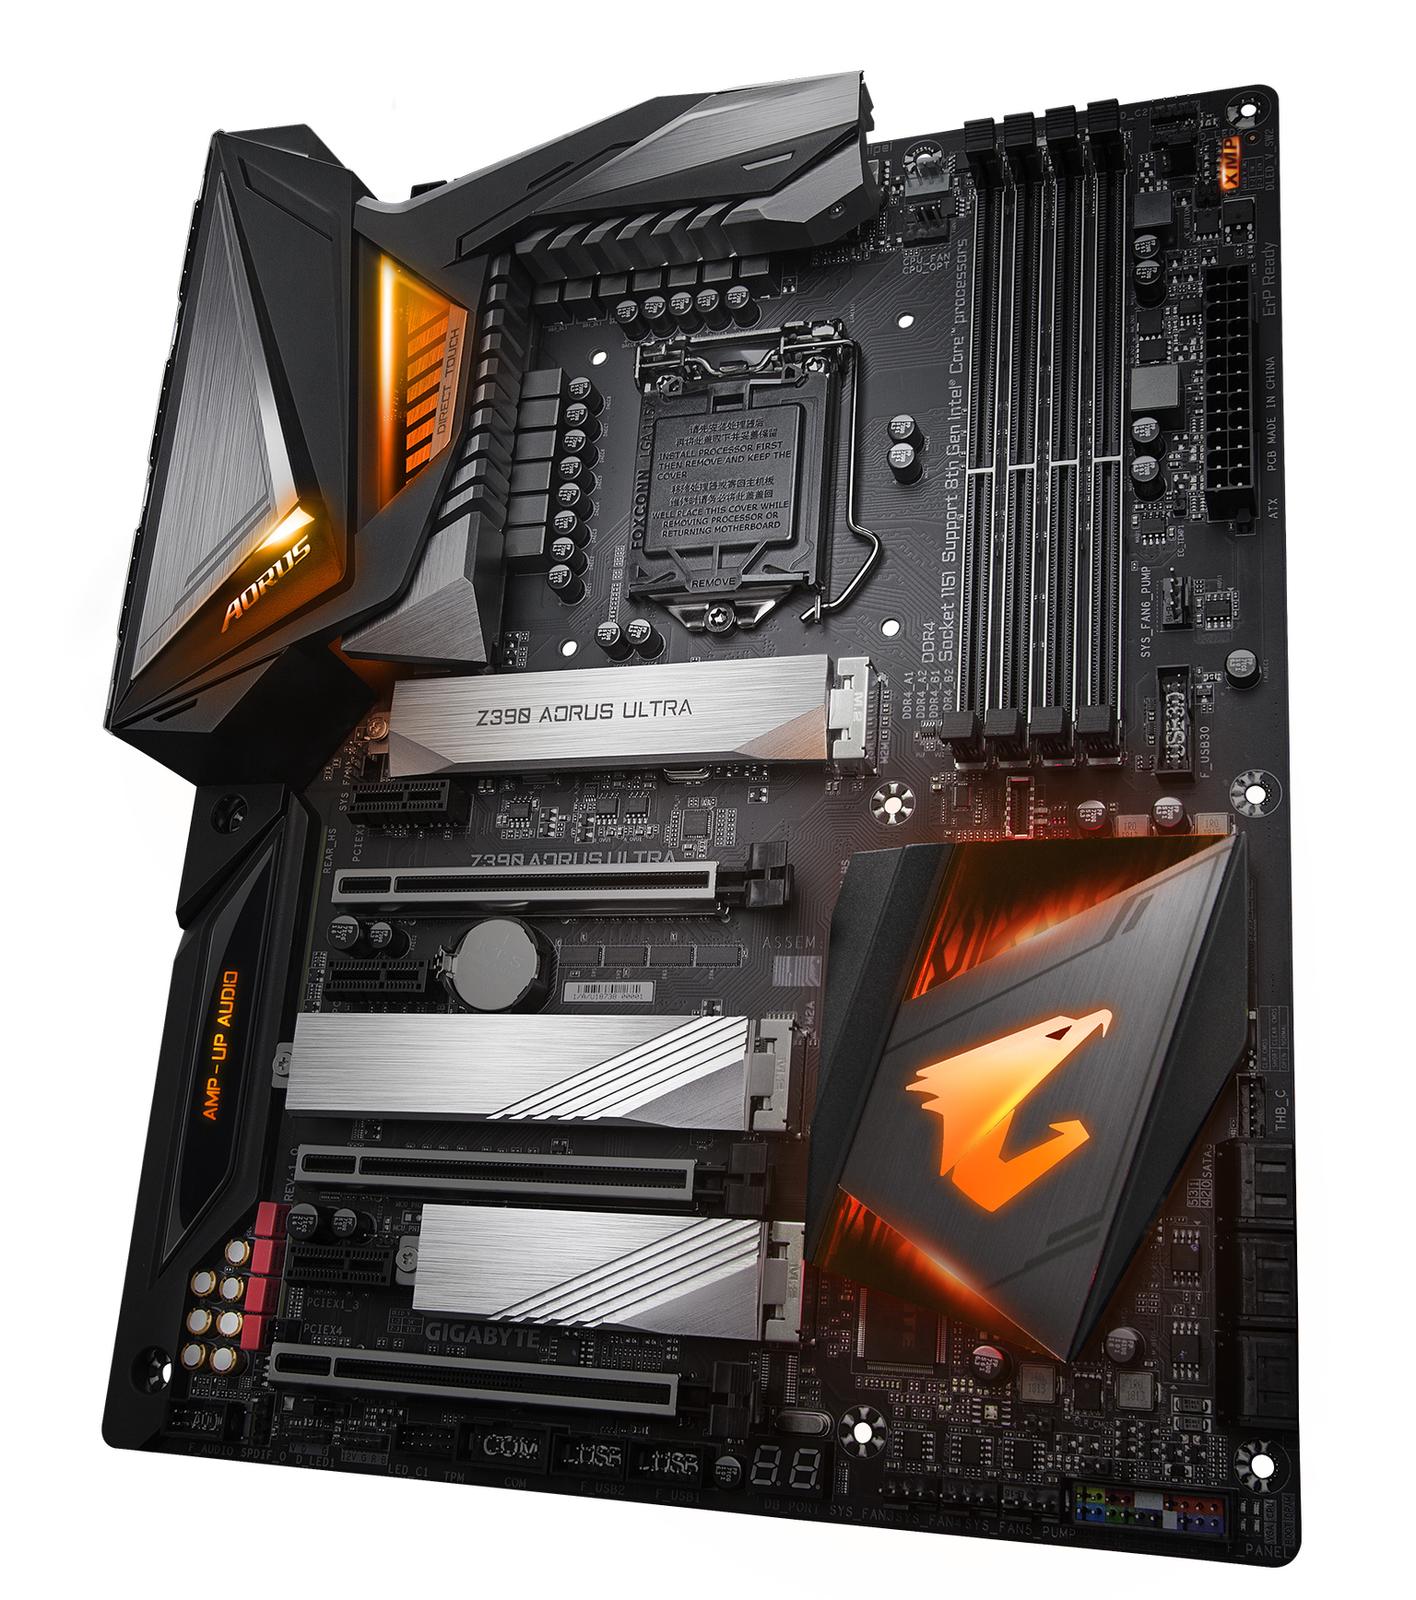 Gigabyte Z390 Aorus Ultra Motherboard image